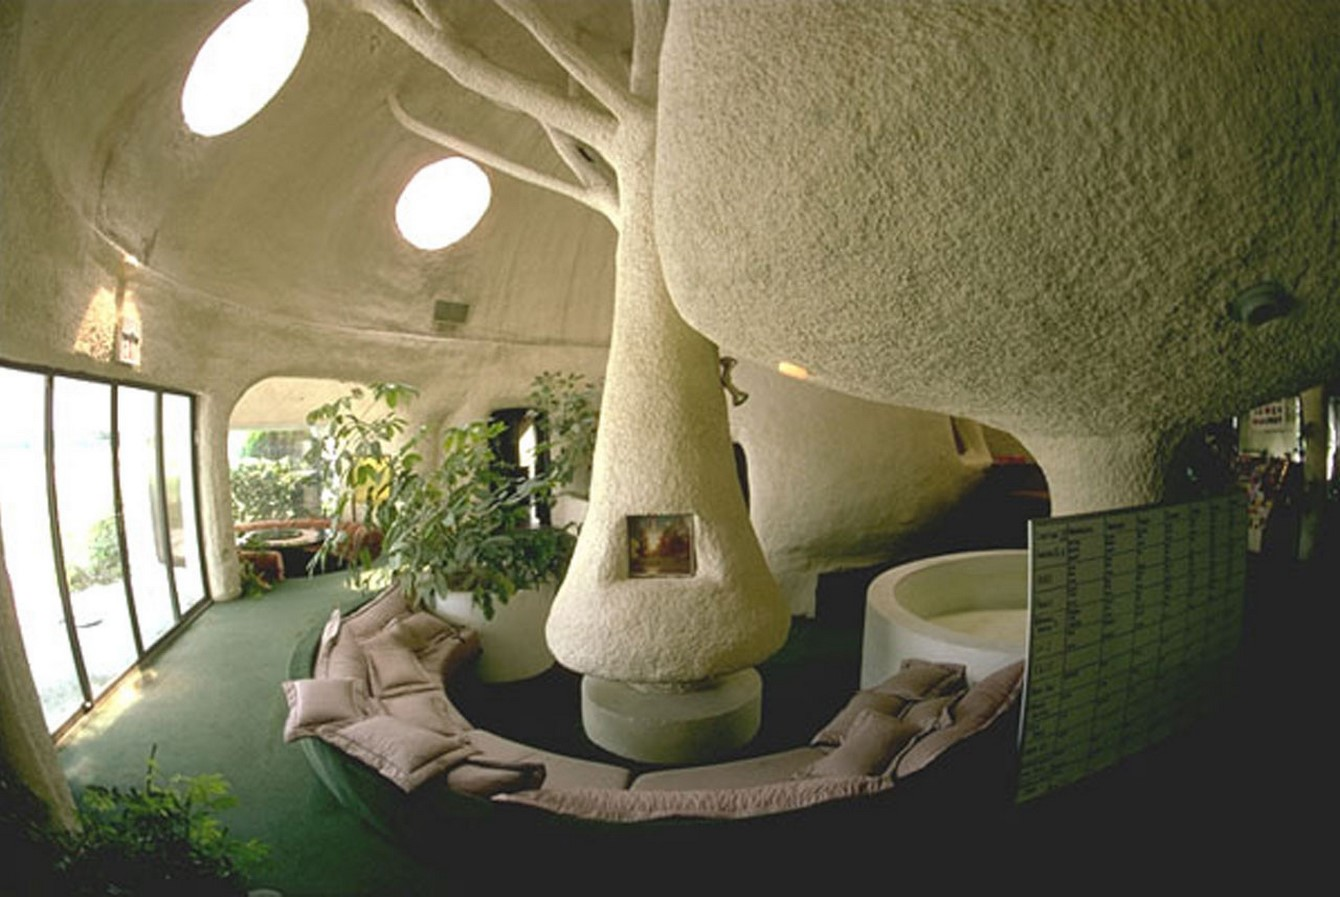 Xanadu Houses: A series of Experimental Homes - sheet10